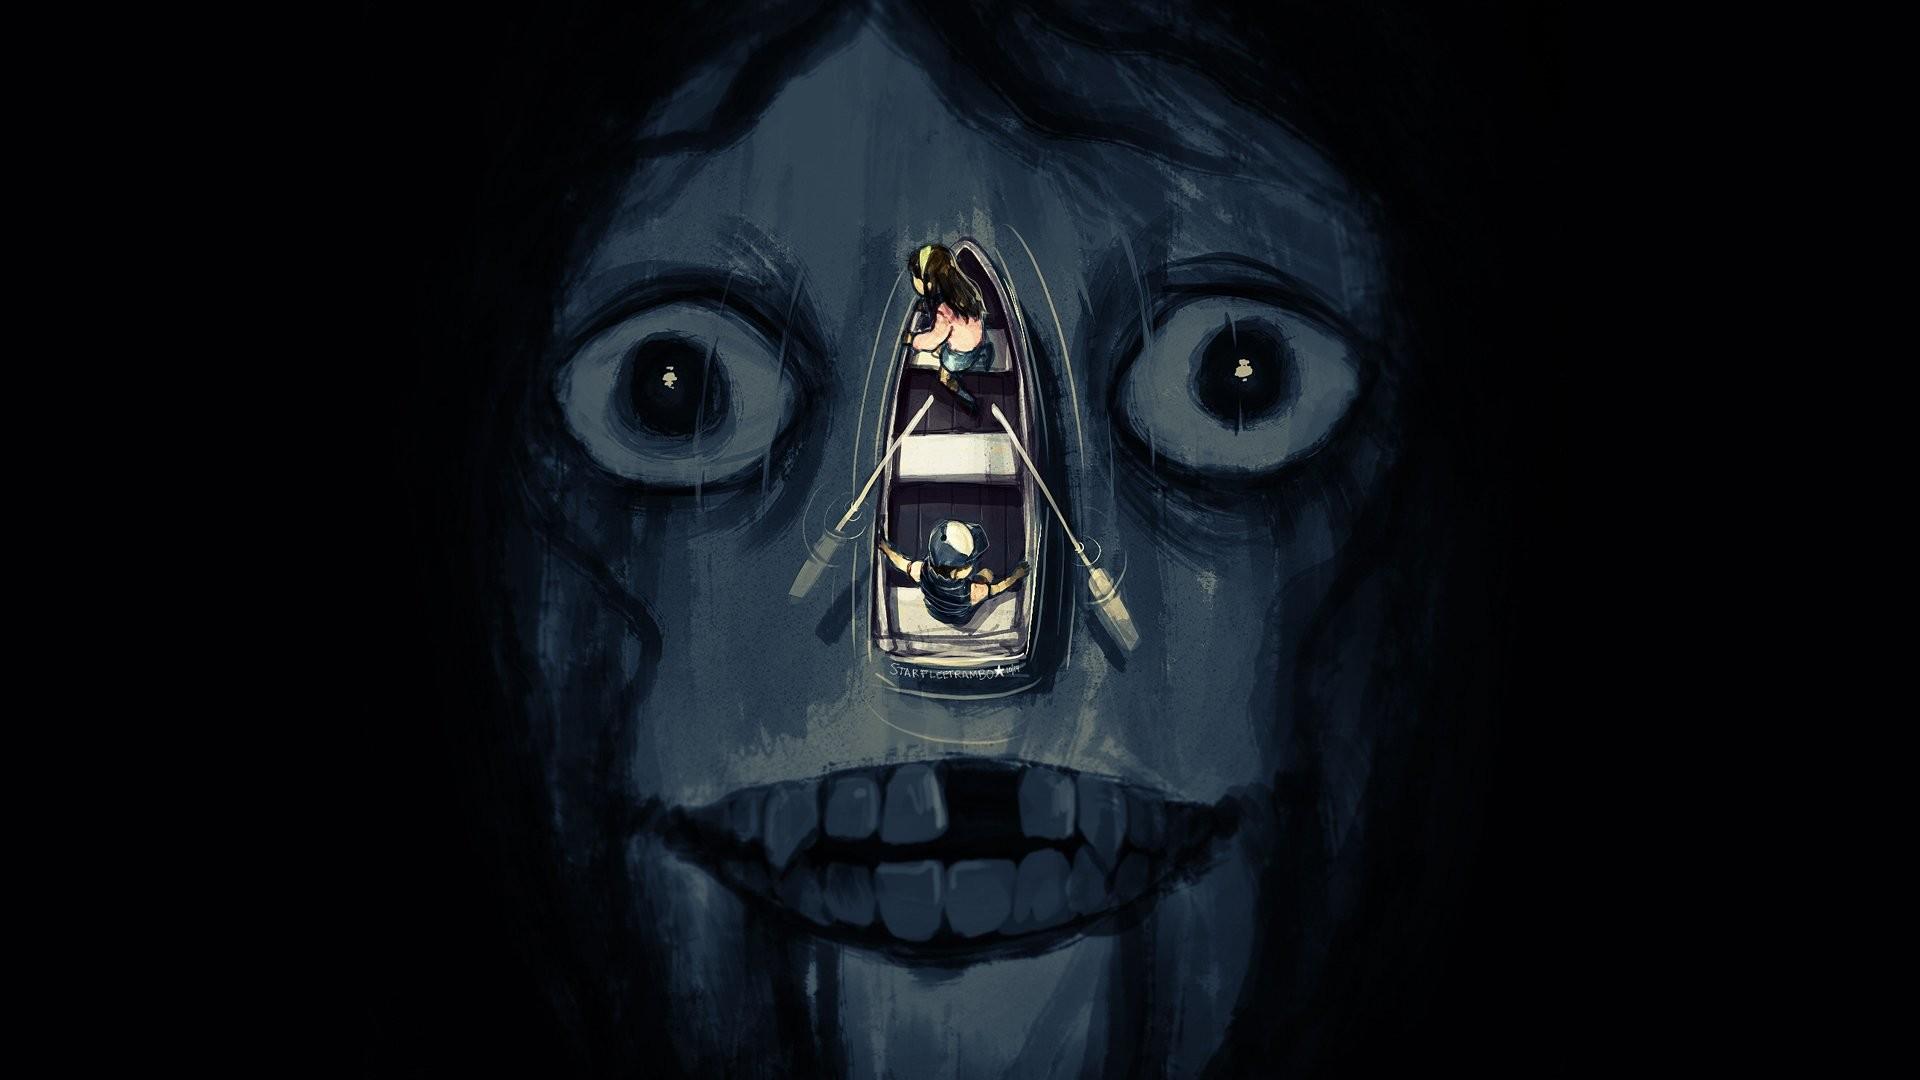 Dark Evil Horror Spooky Creepy Scary Wallpaper At Dark Wallpapers